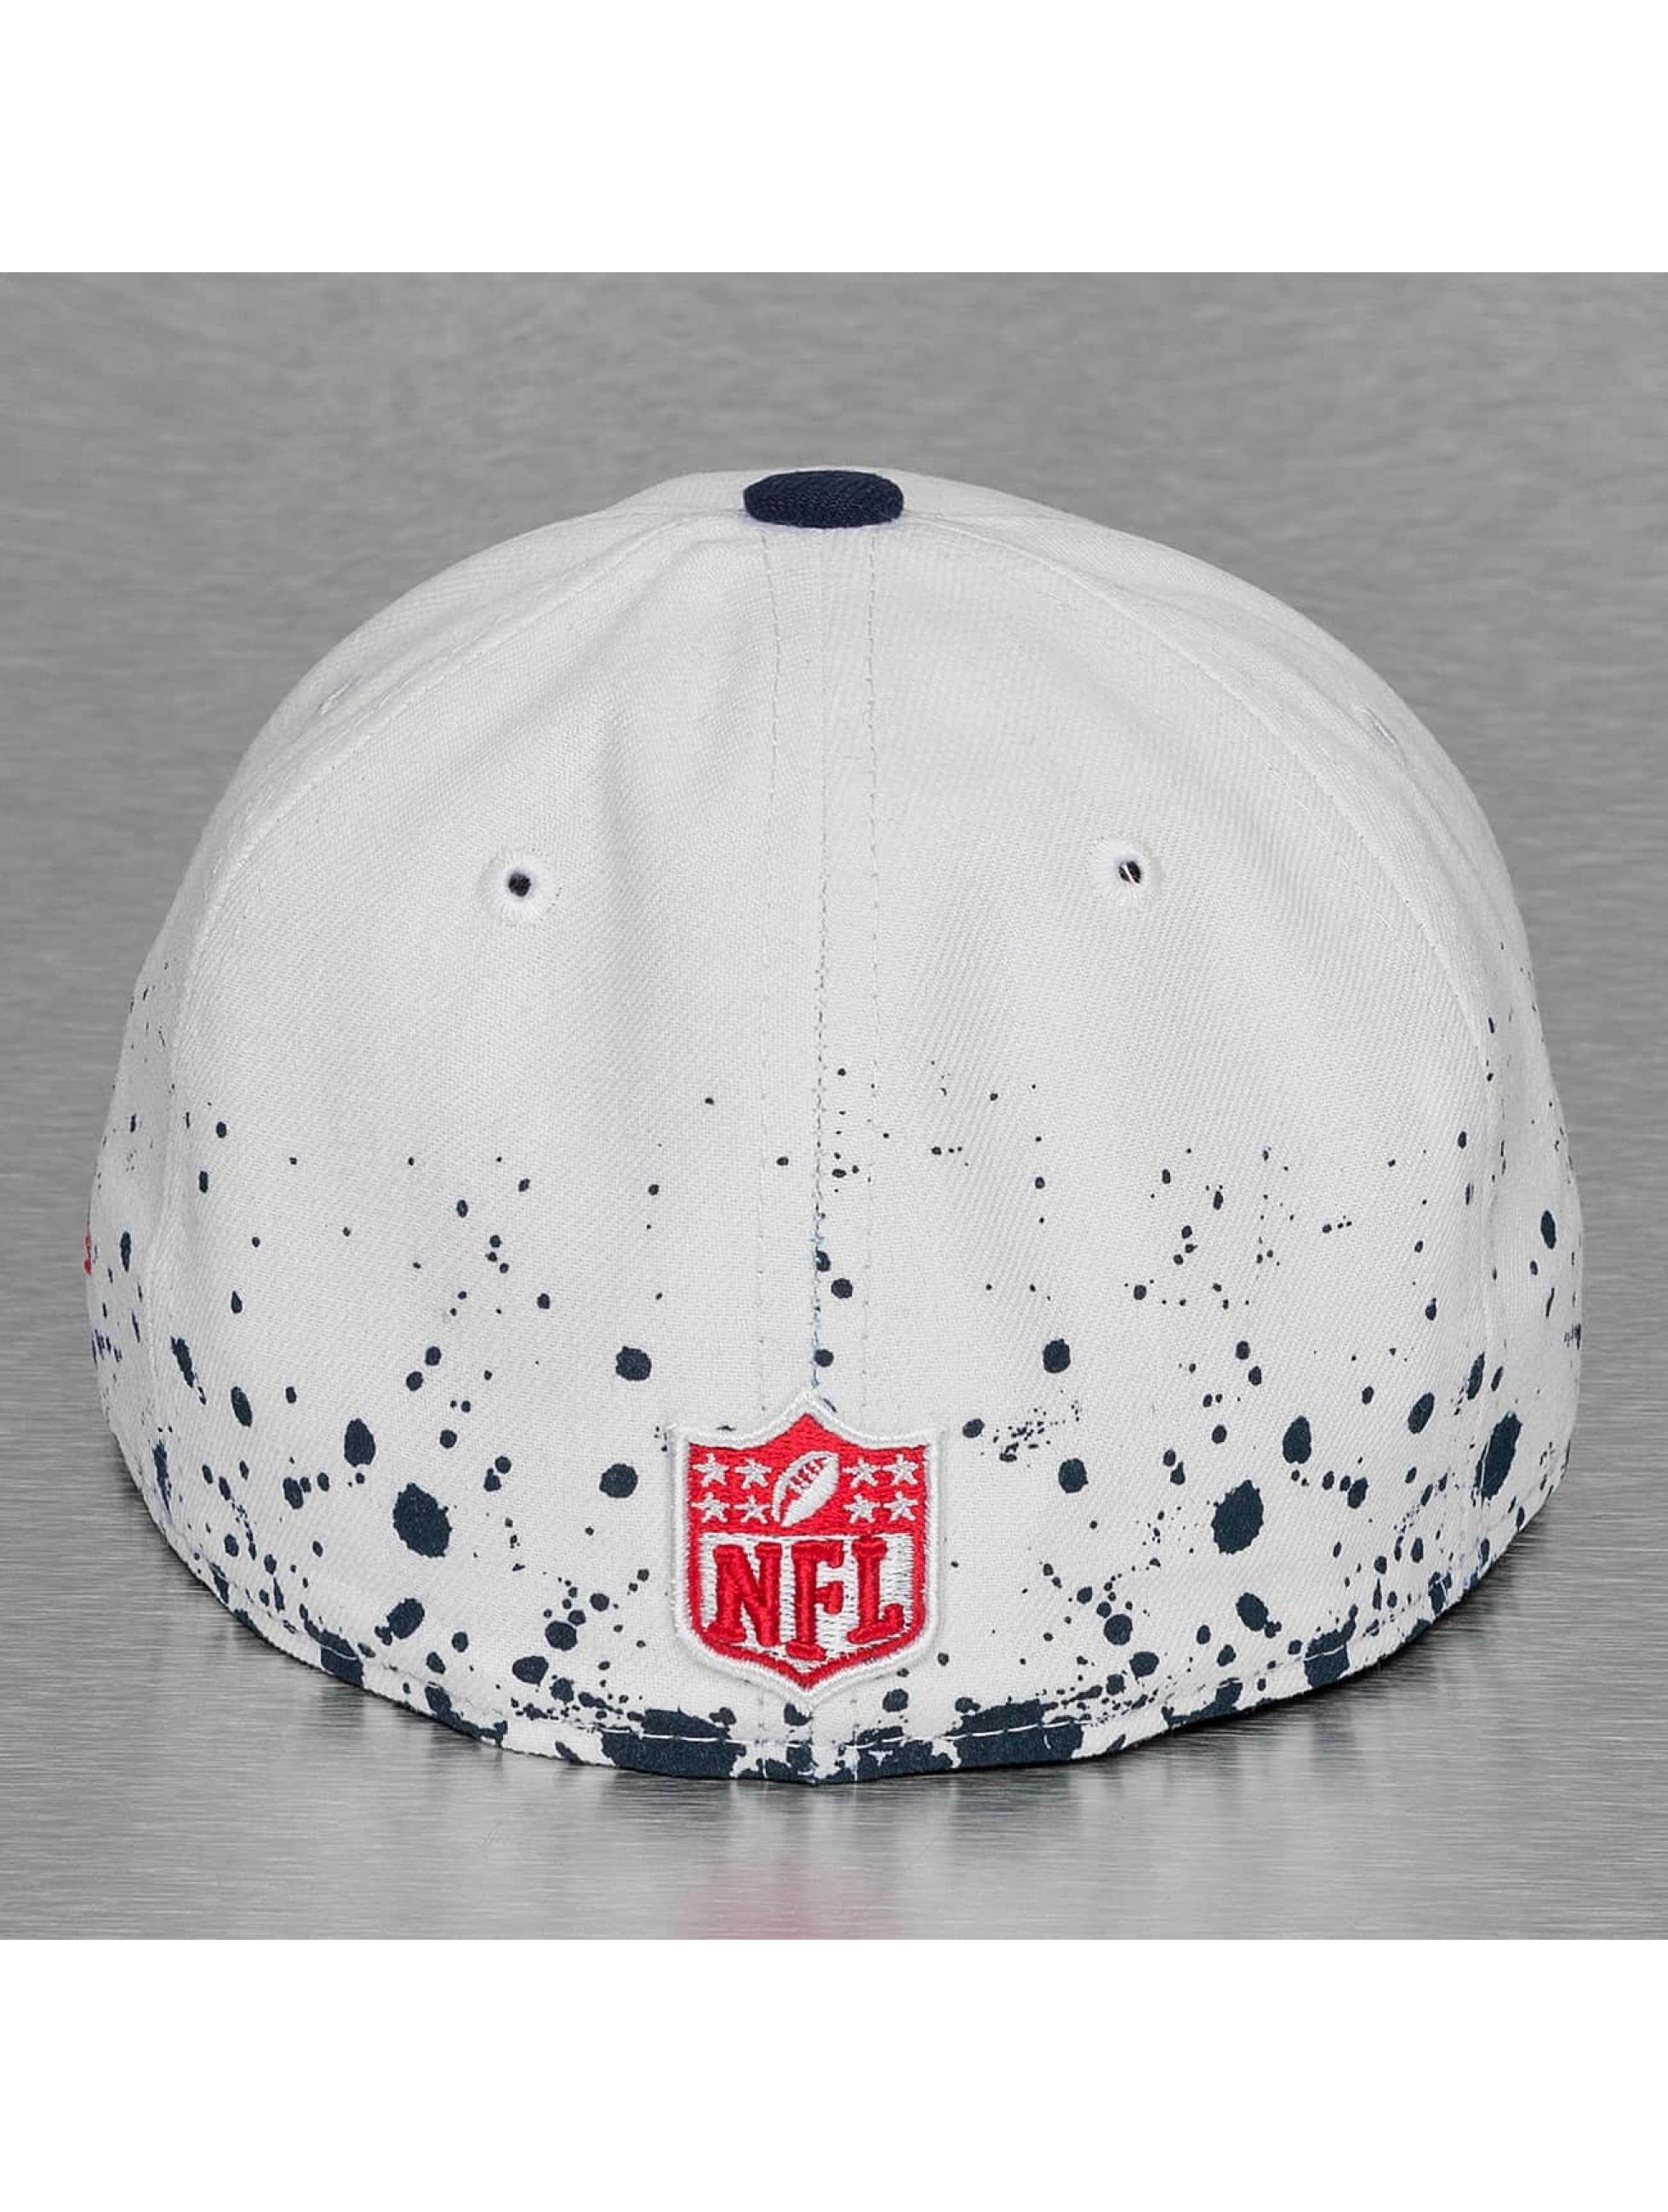 New Era Fitted Cap Splatter New England Patriots white